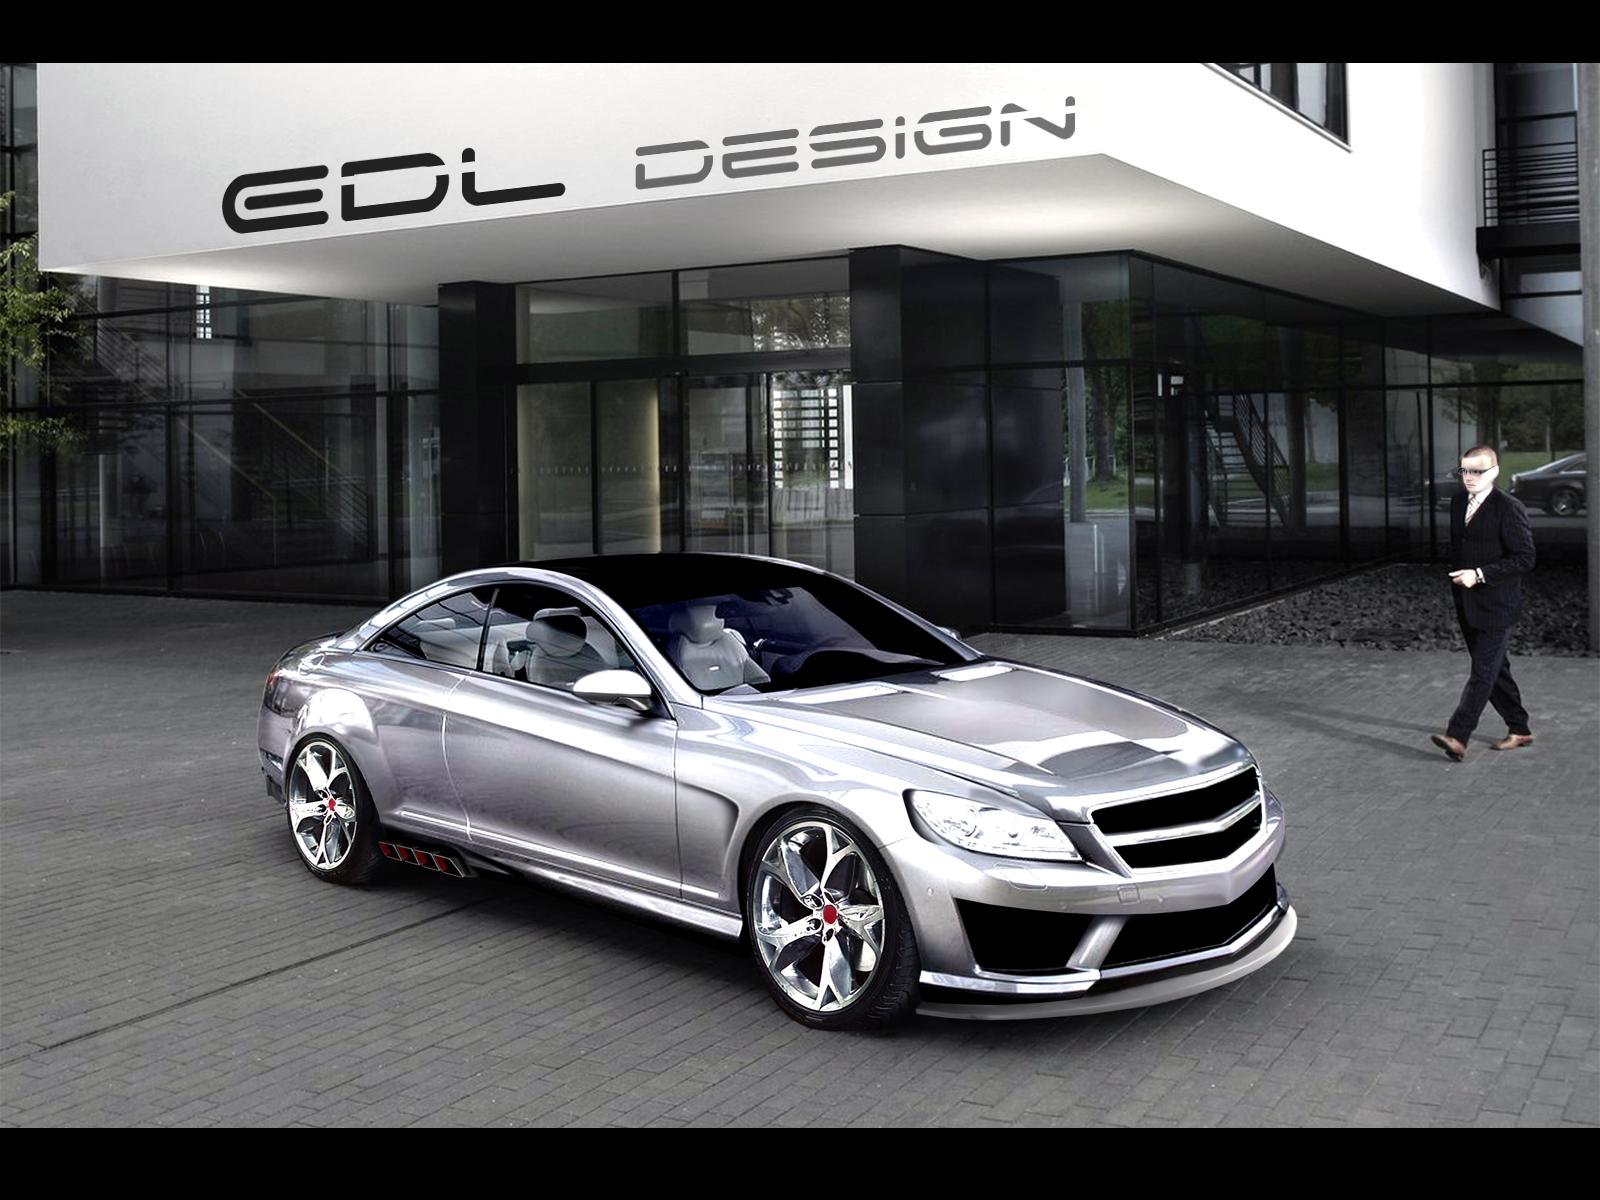 Chrome mercedes benz cl63 amg by edldesign on deviantart for Mercedes benz chrome